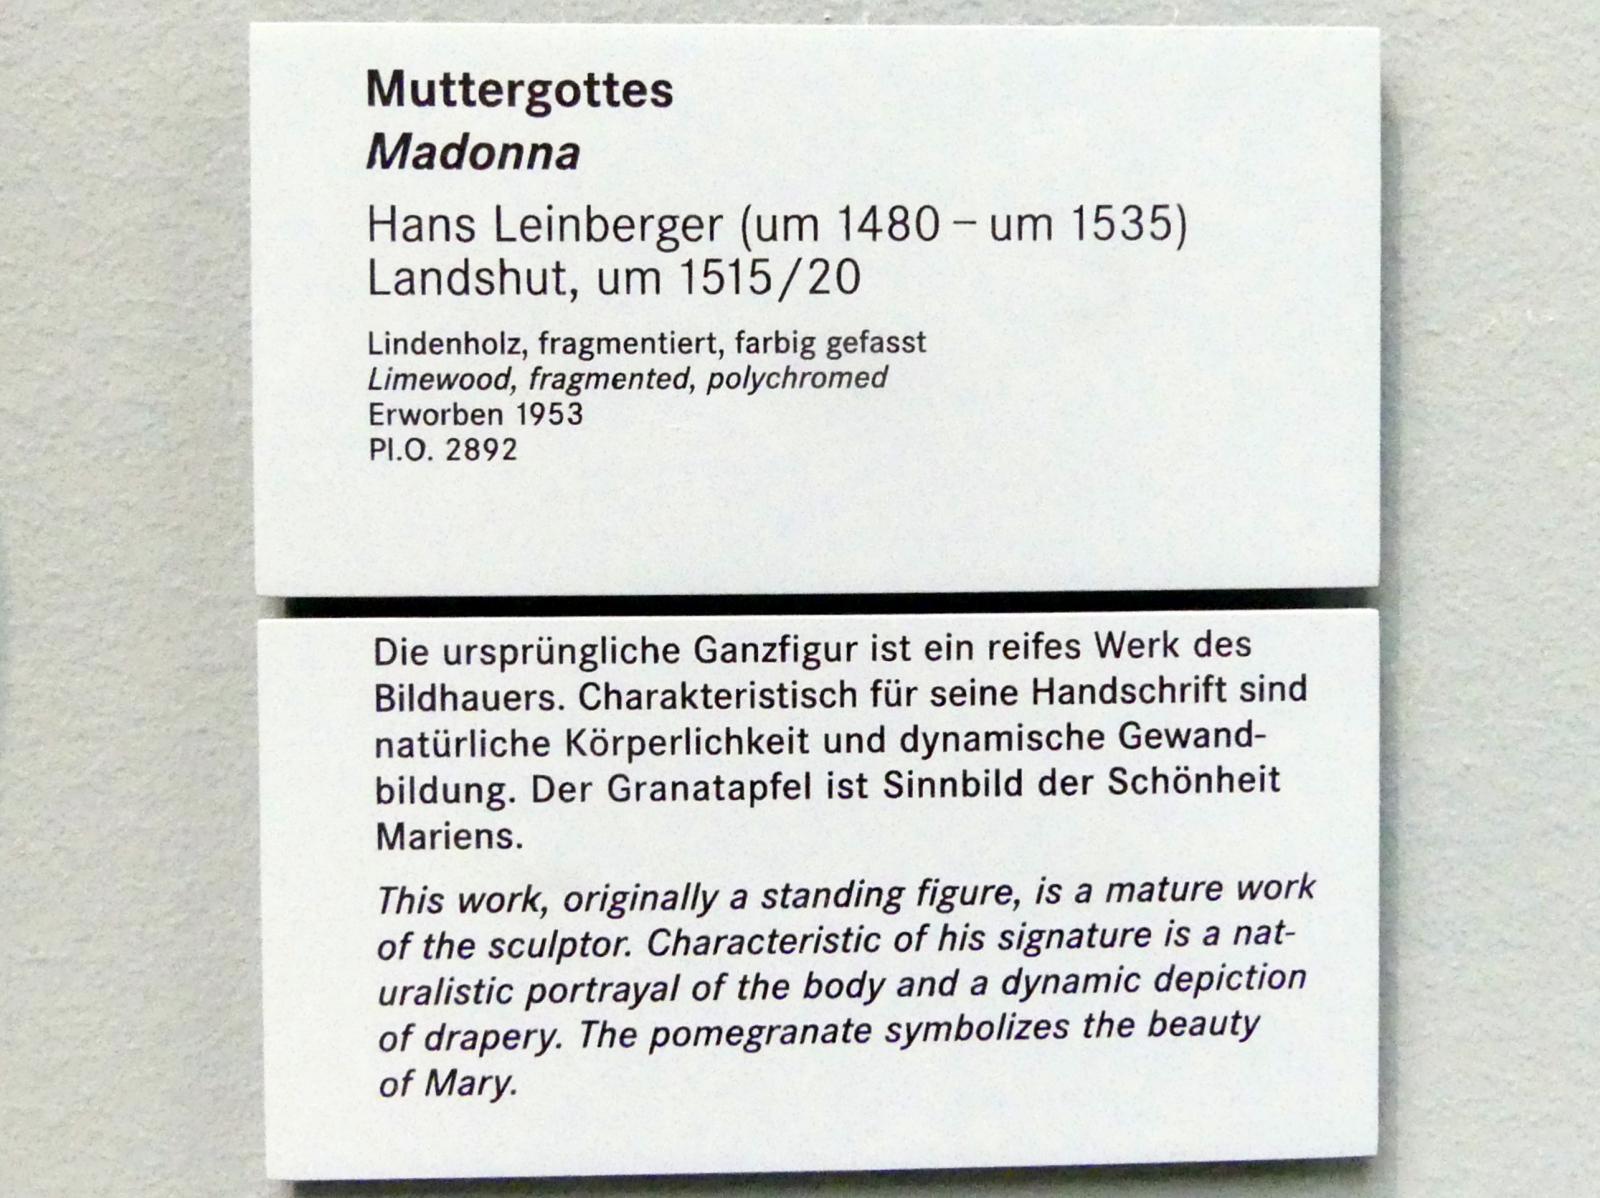 Hans Leinberger: Muttergottes, Um 1515 - 1520